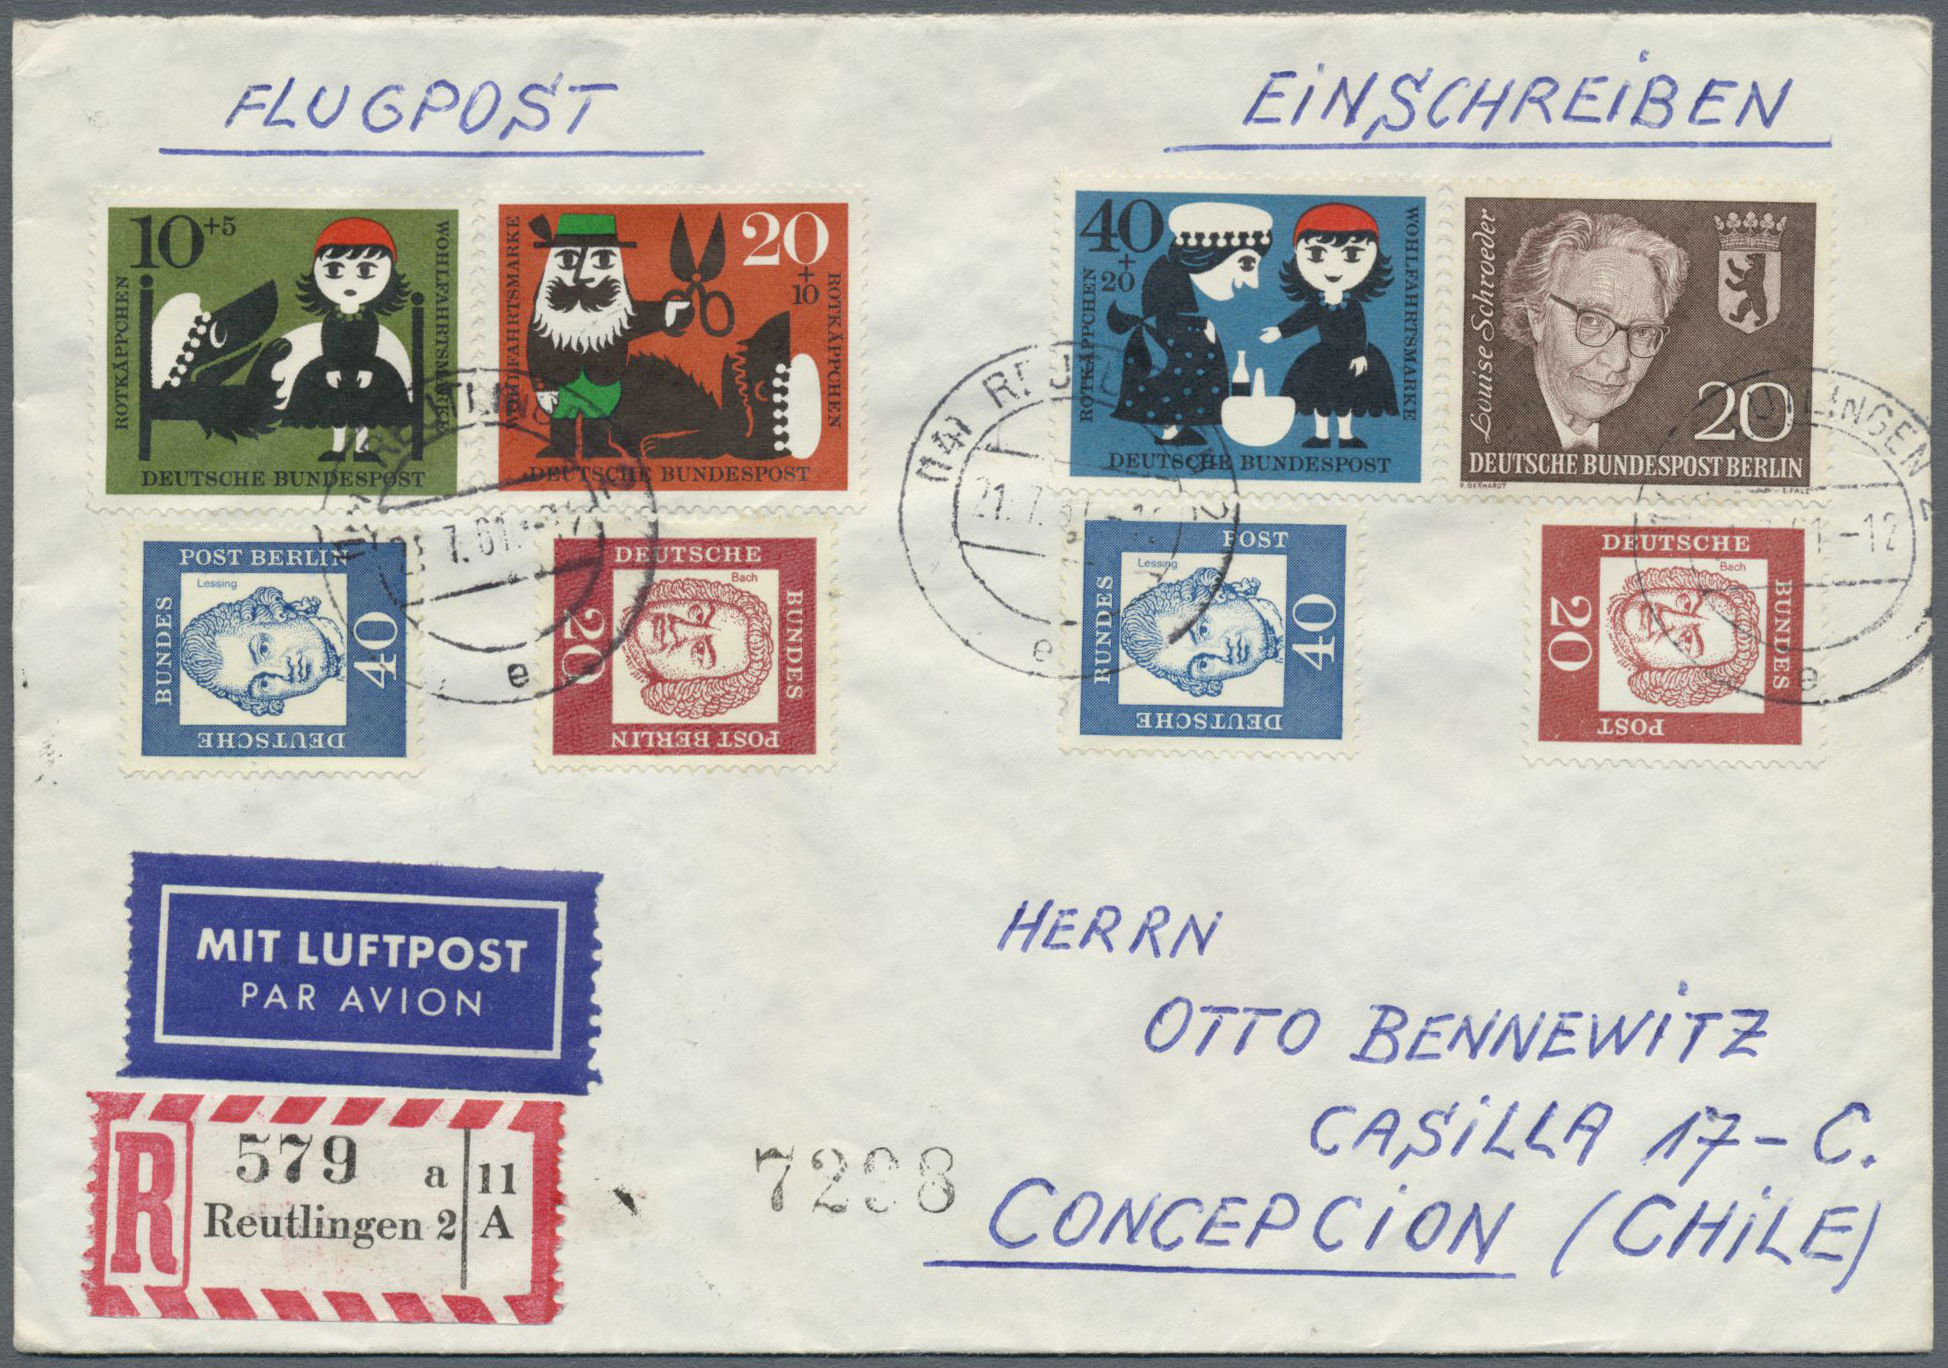 Lot 38343 - bundesrepublik deutschland  -  Auktionshaus Christoph Gärtner GmbH & Co. KG Collections Germany,  Collections Supplement, Surprise boxes #39 Day 7